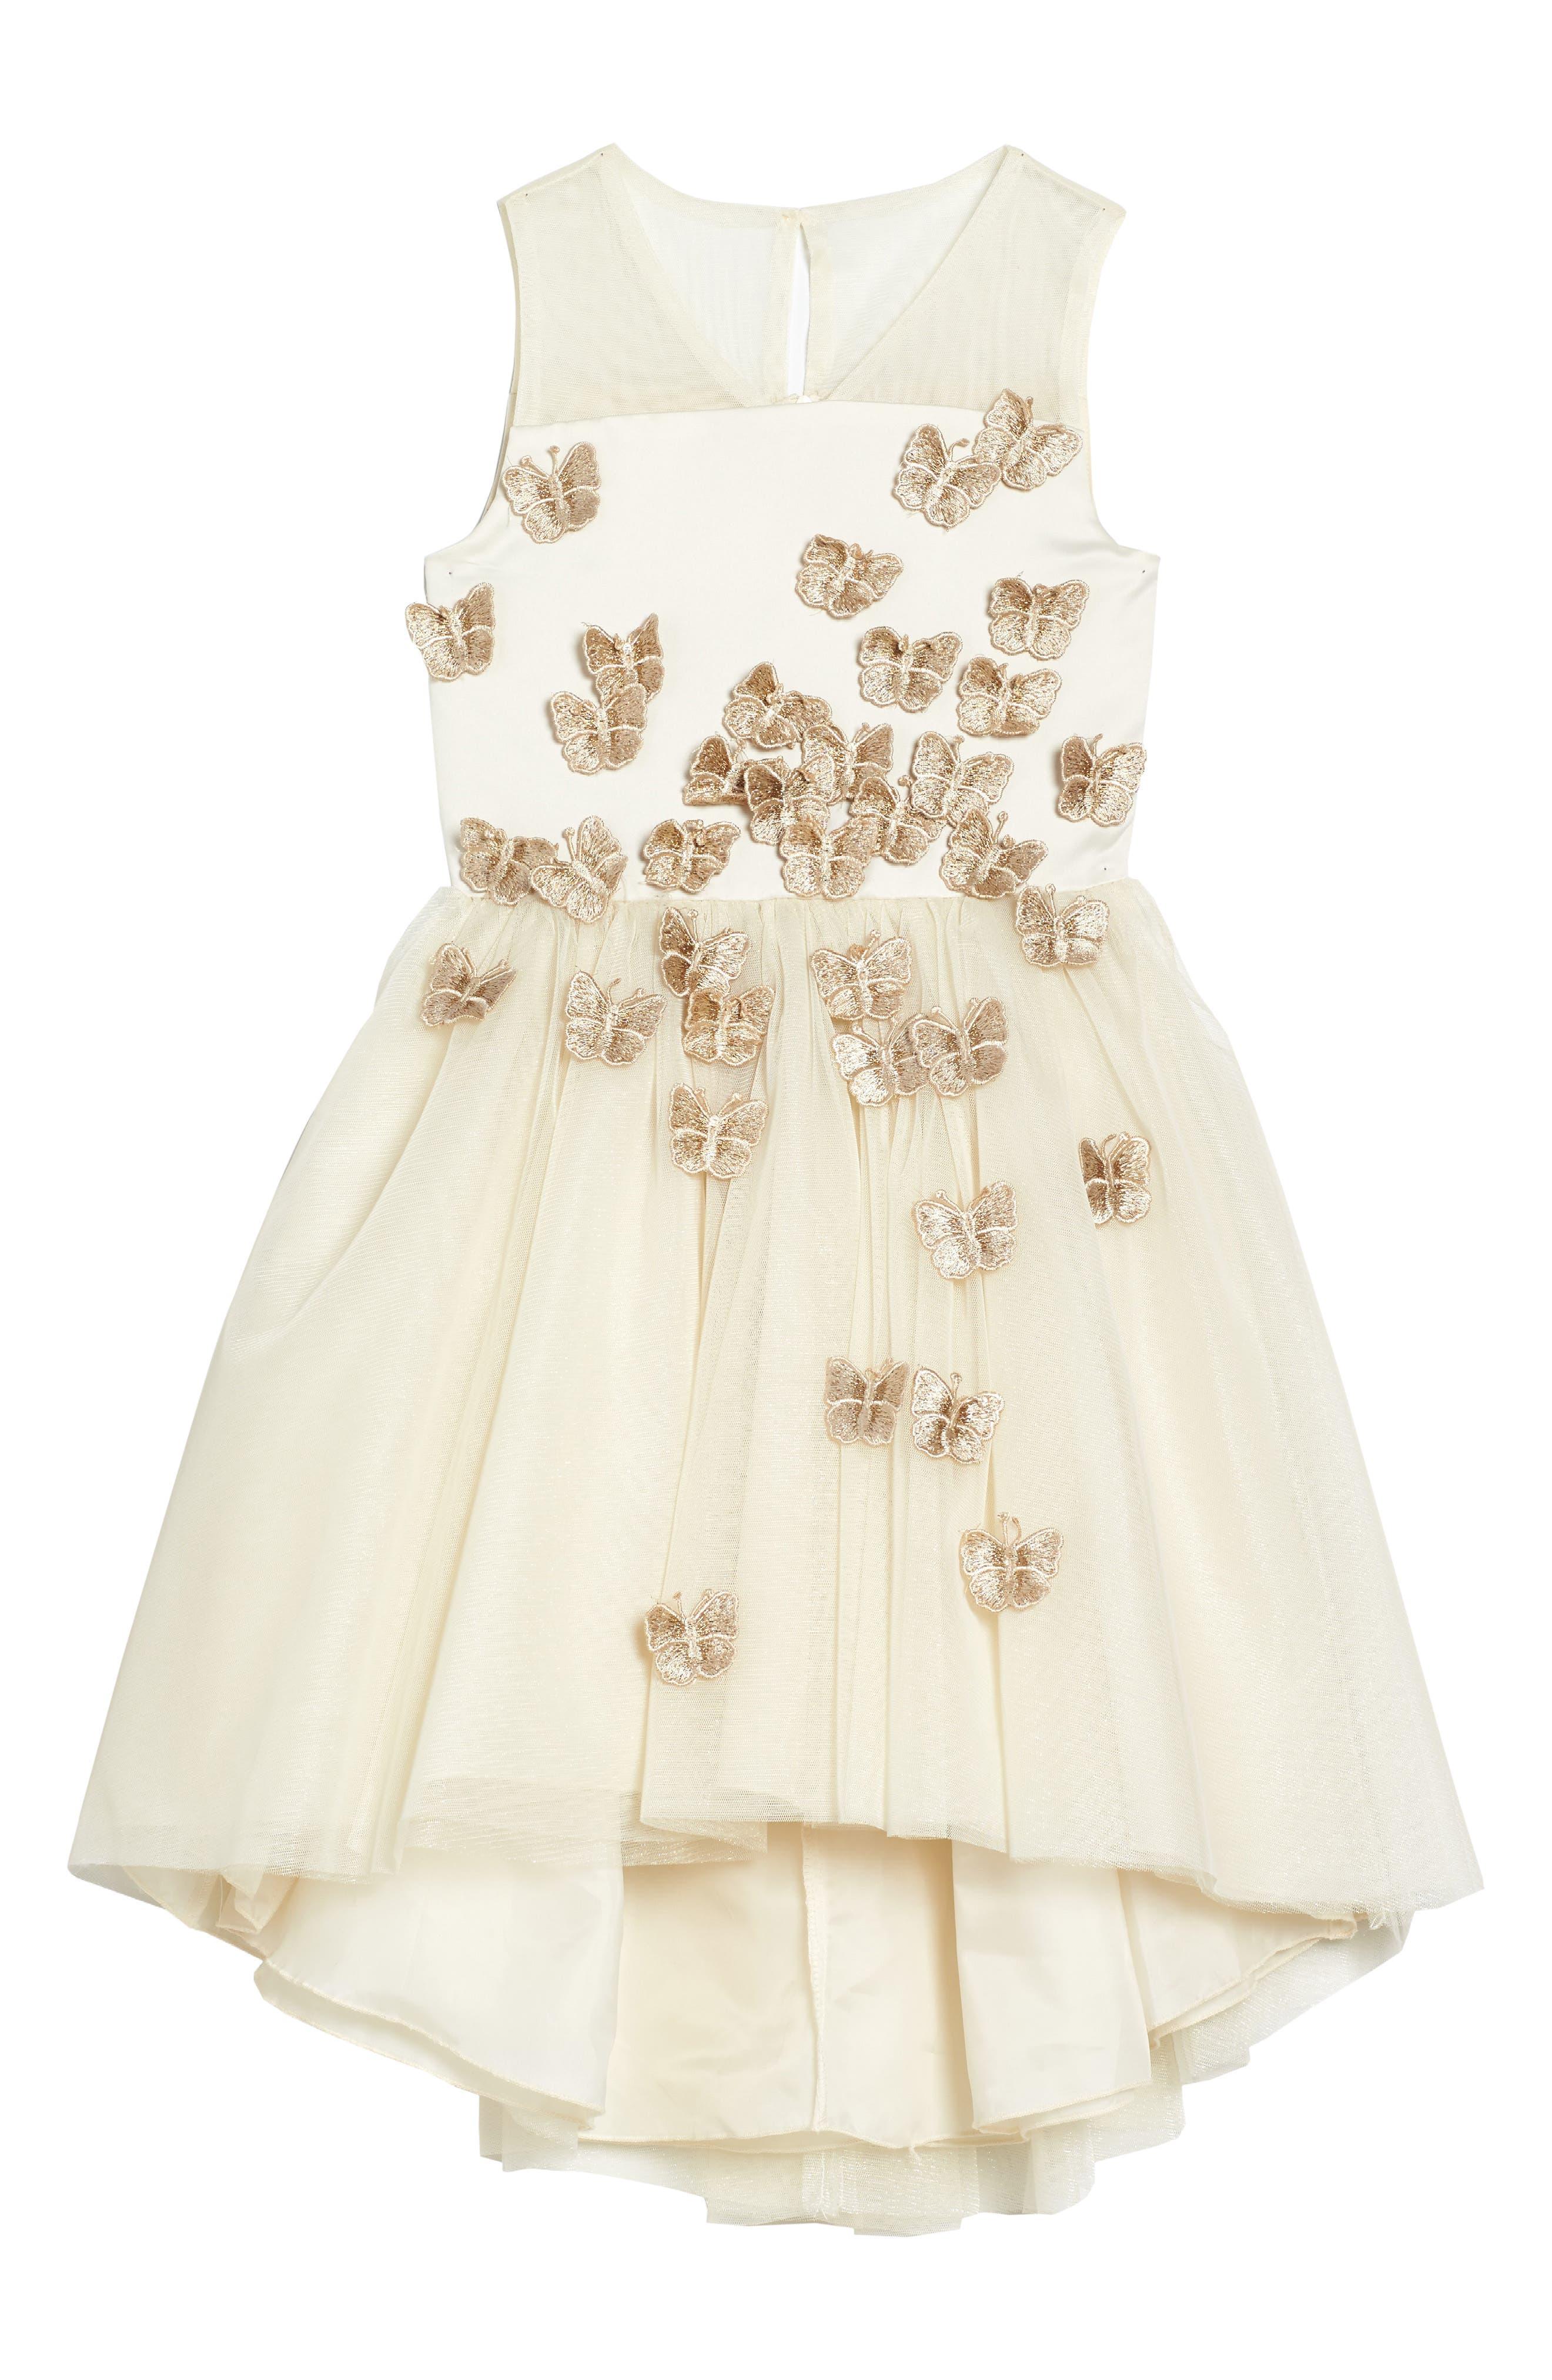 Main Image - Nanette Lapore Butterfly Dress (Big Girls)